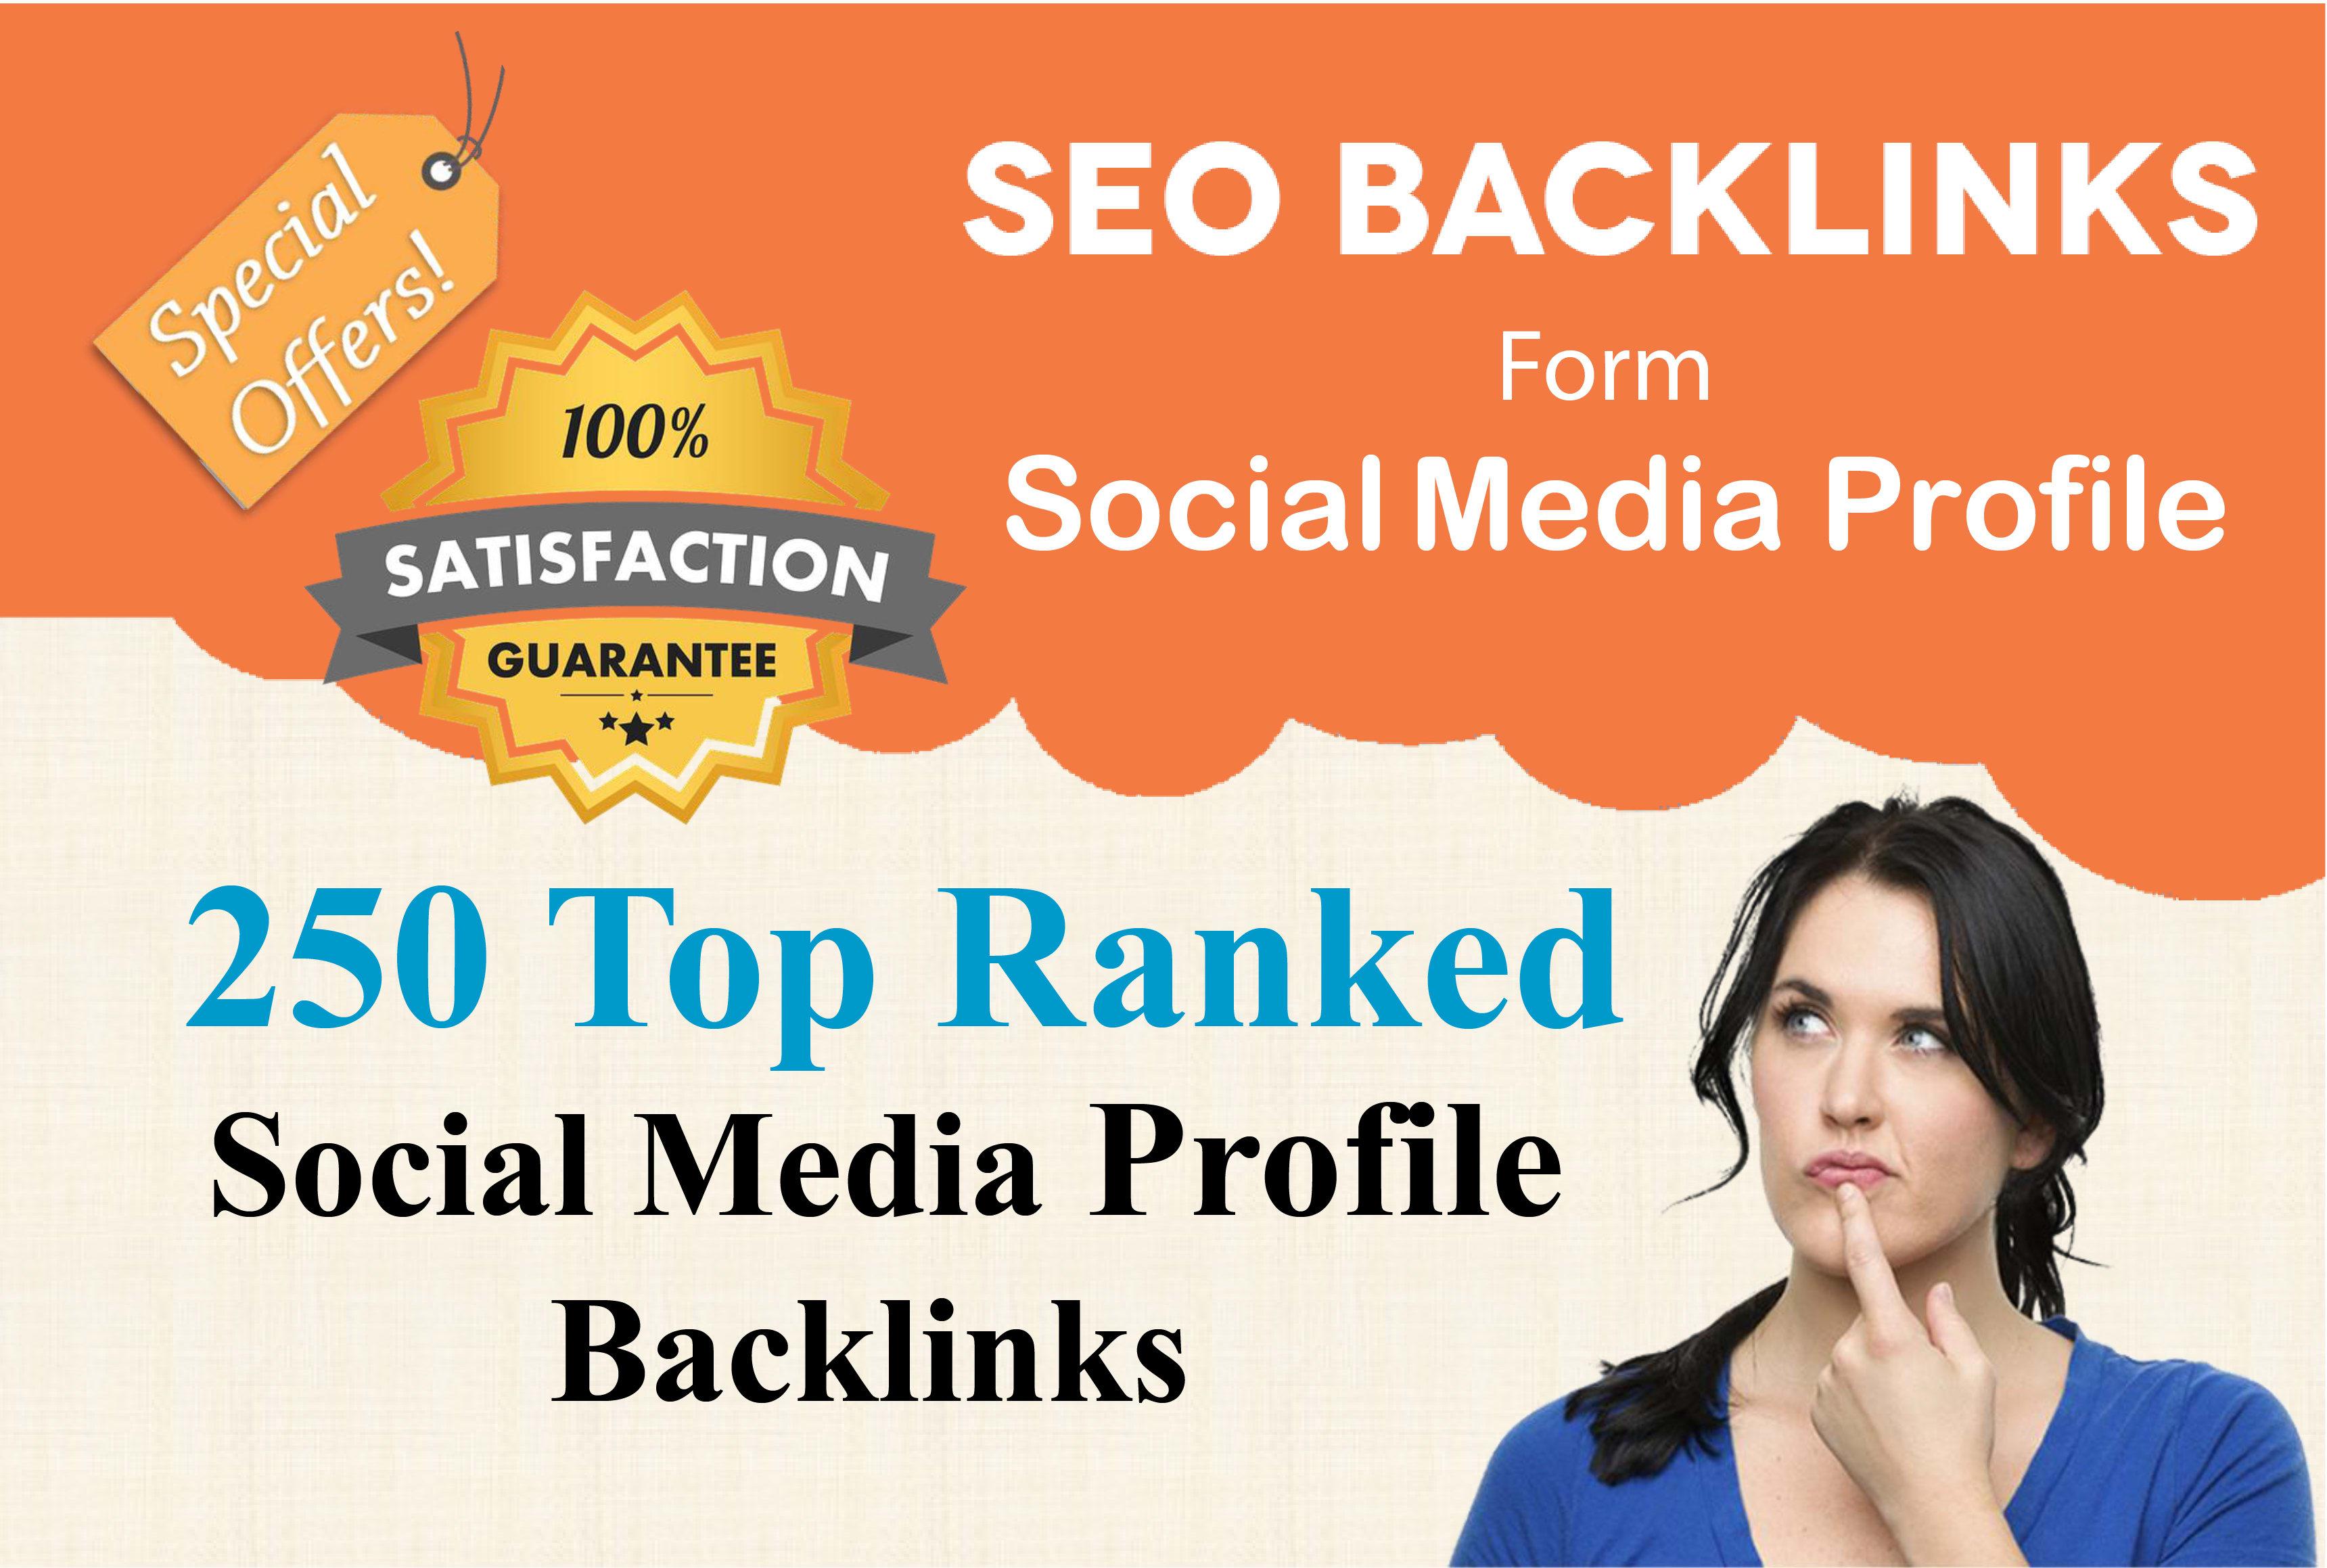 Create 250 high da social media profiles backlinks